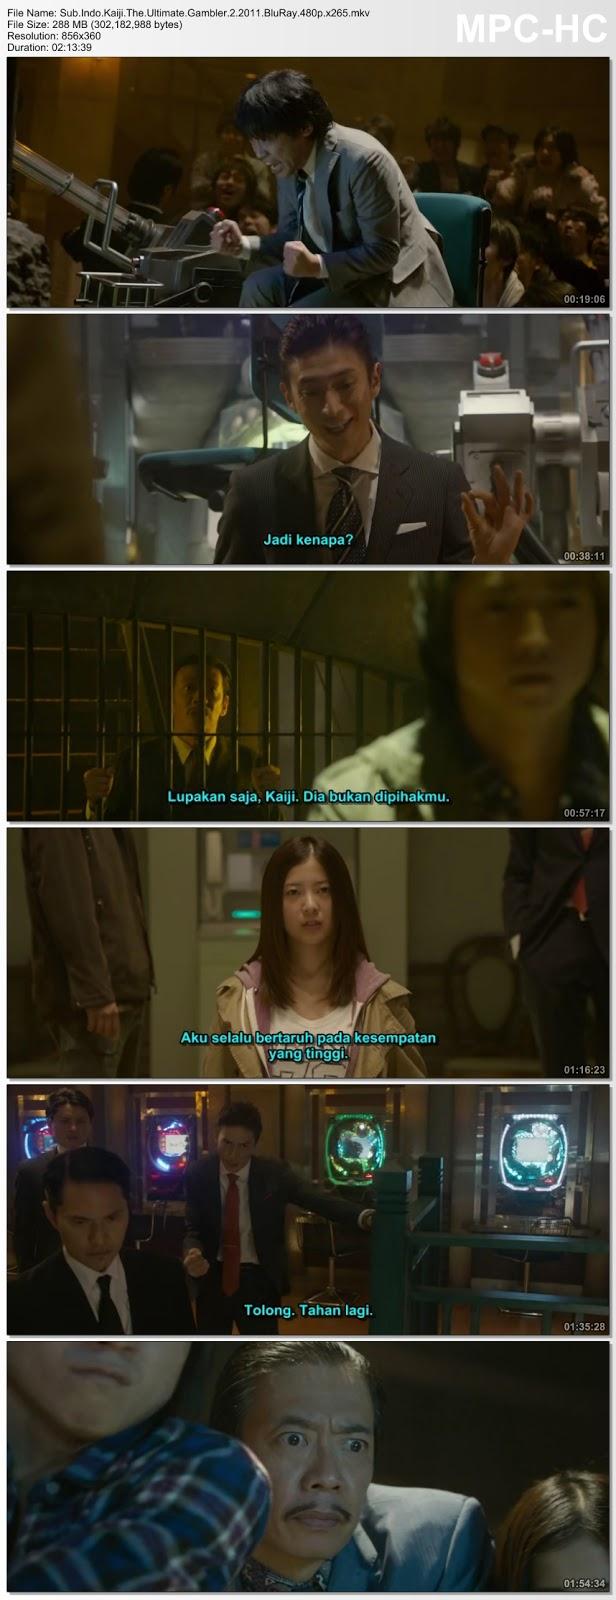 Screenshots Movie Sub.Indo.Kaiji 2: Jinsei Gyakuten gemu aka Kaiji 2: The Ultimate Gambler (2011).BluRay.480p.x265.mkv